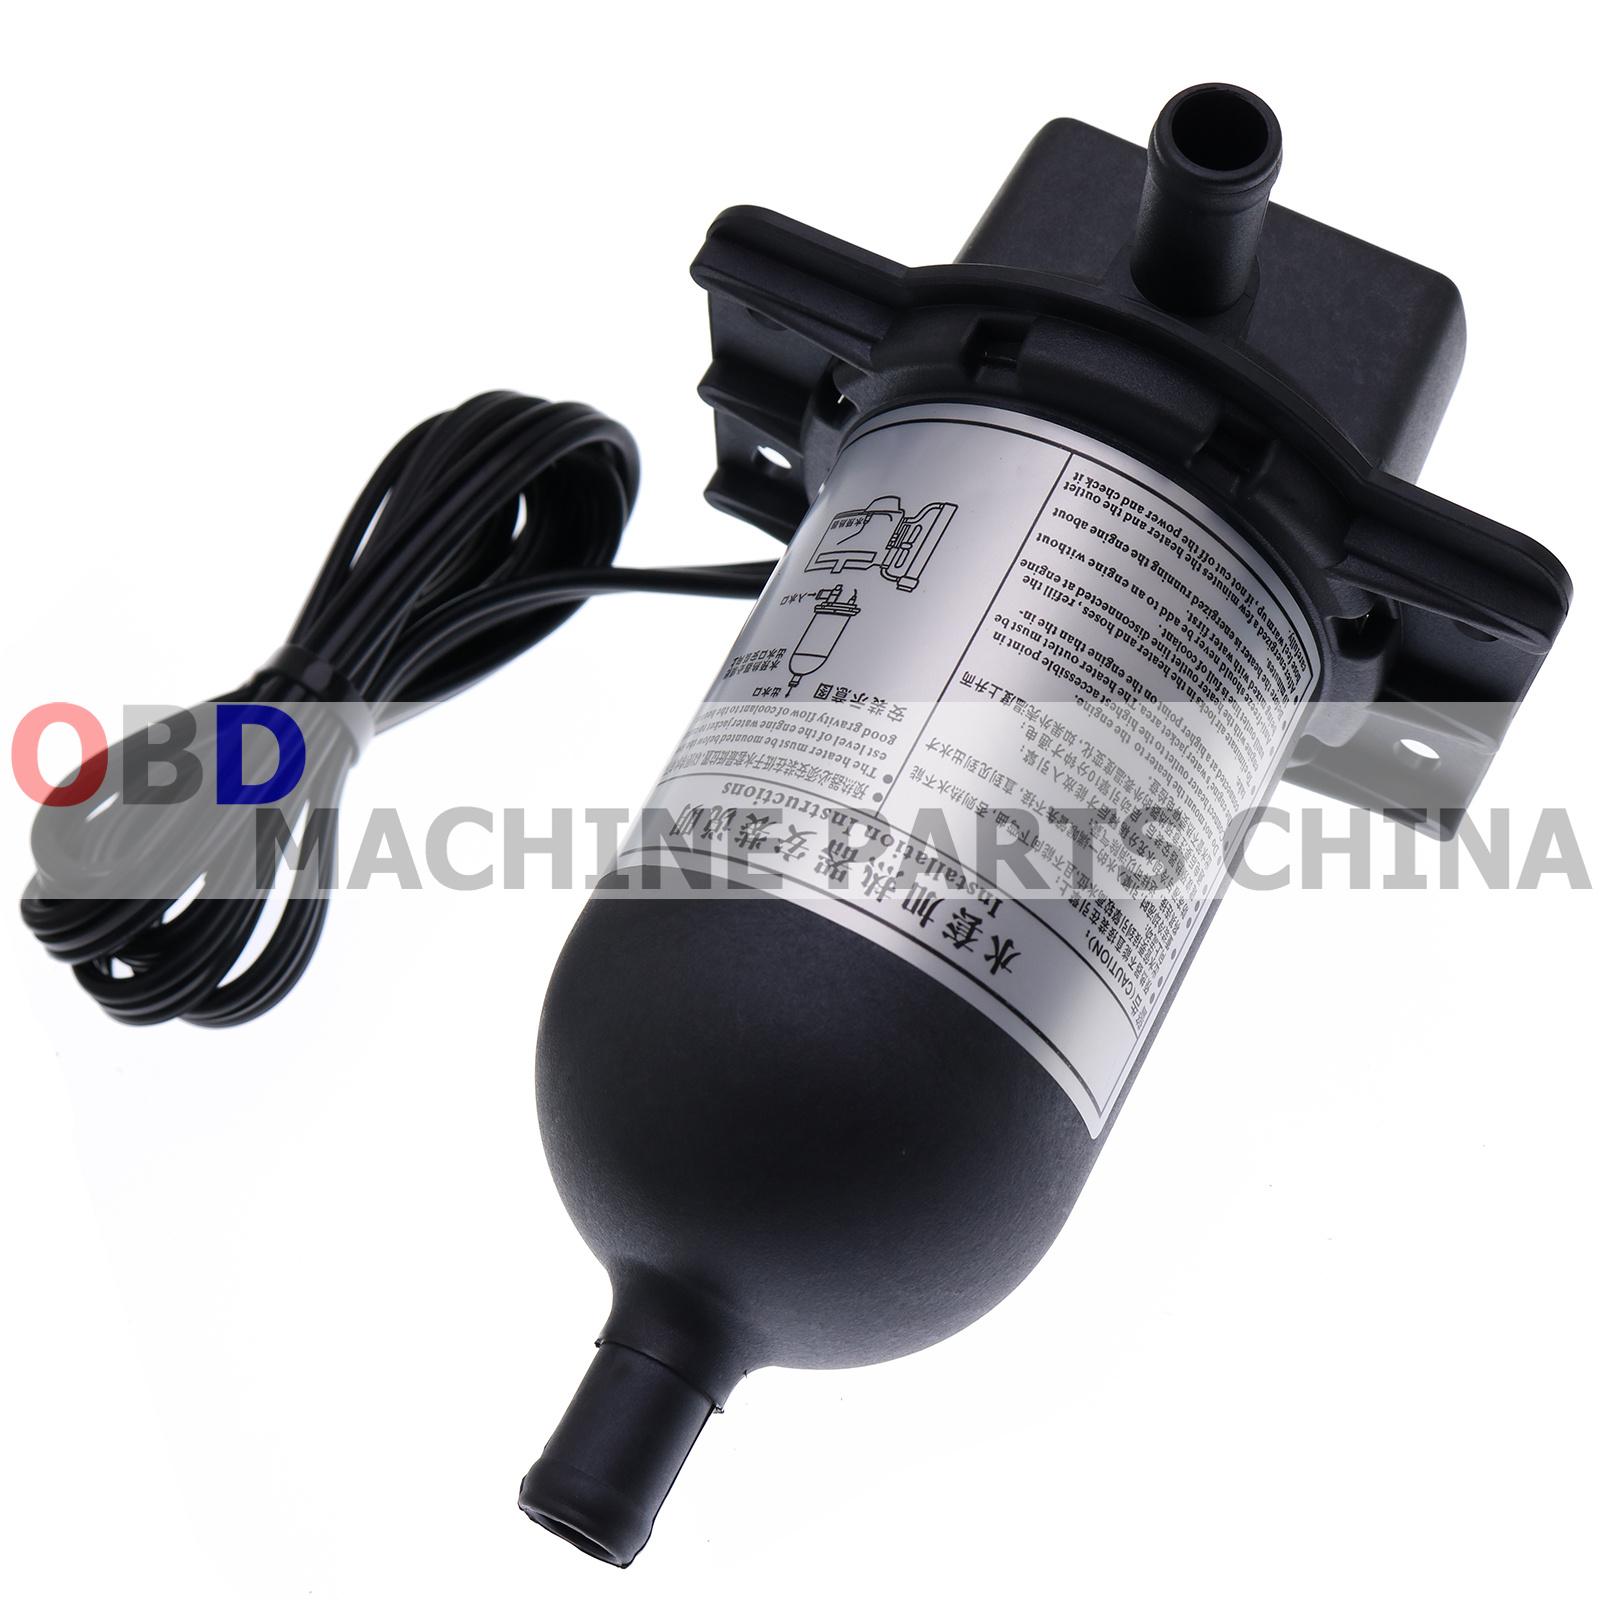 TPS151GT10-000 Engine Block Heater 1500 Watt 120 Volt 1500W 120V Option 100-120F